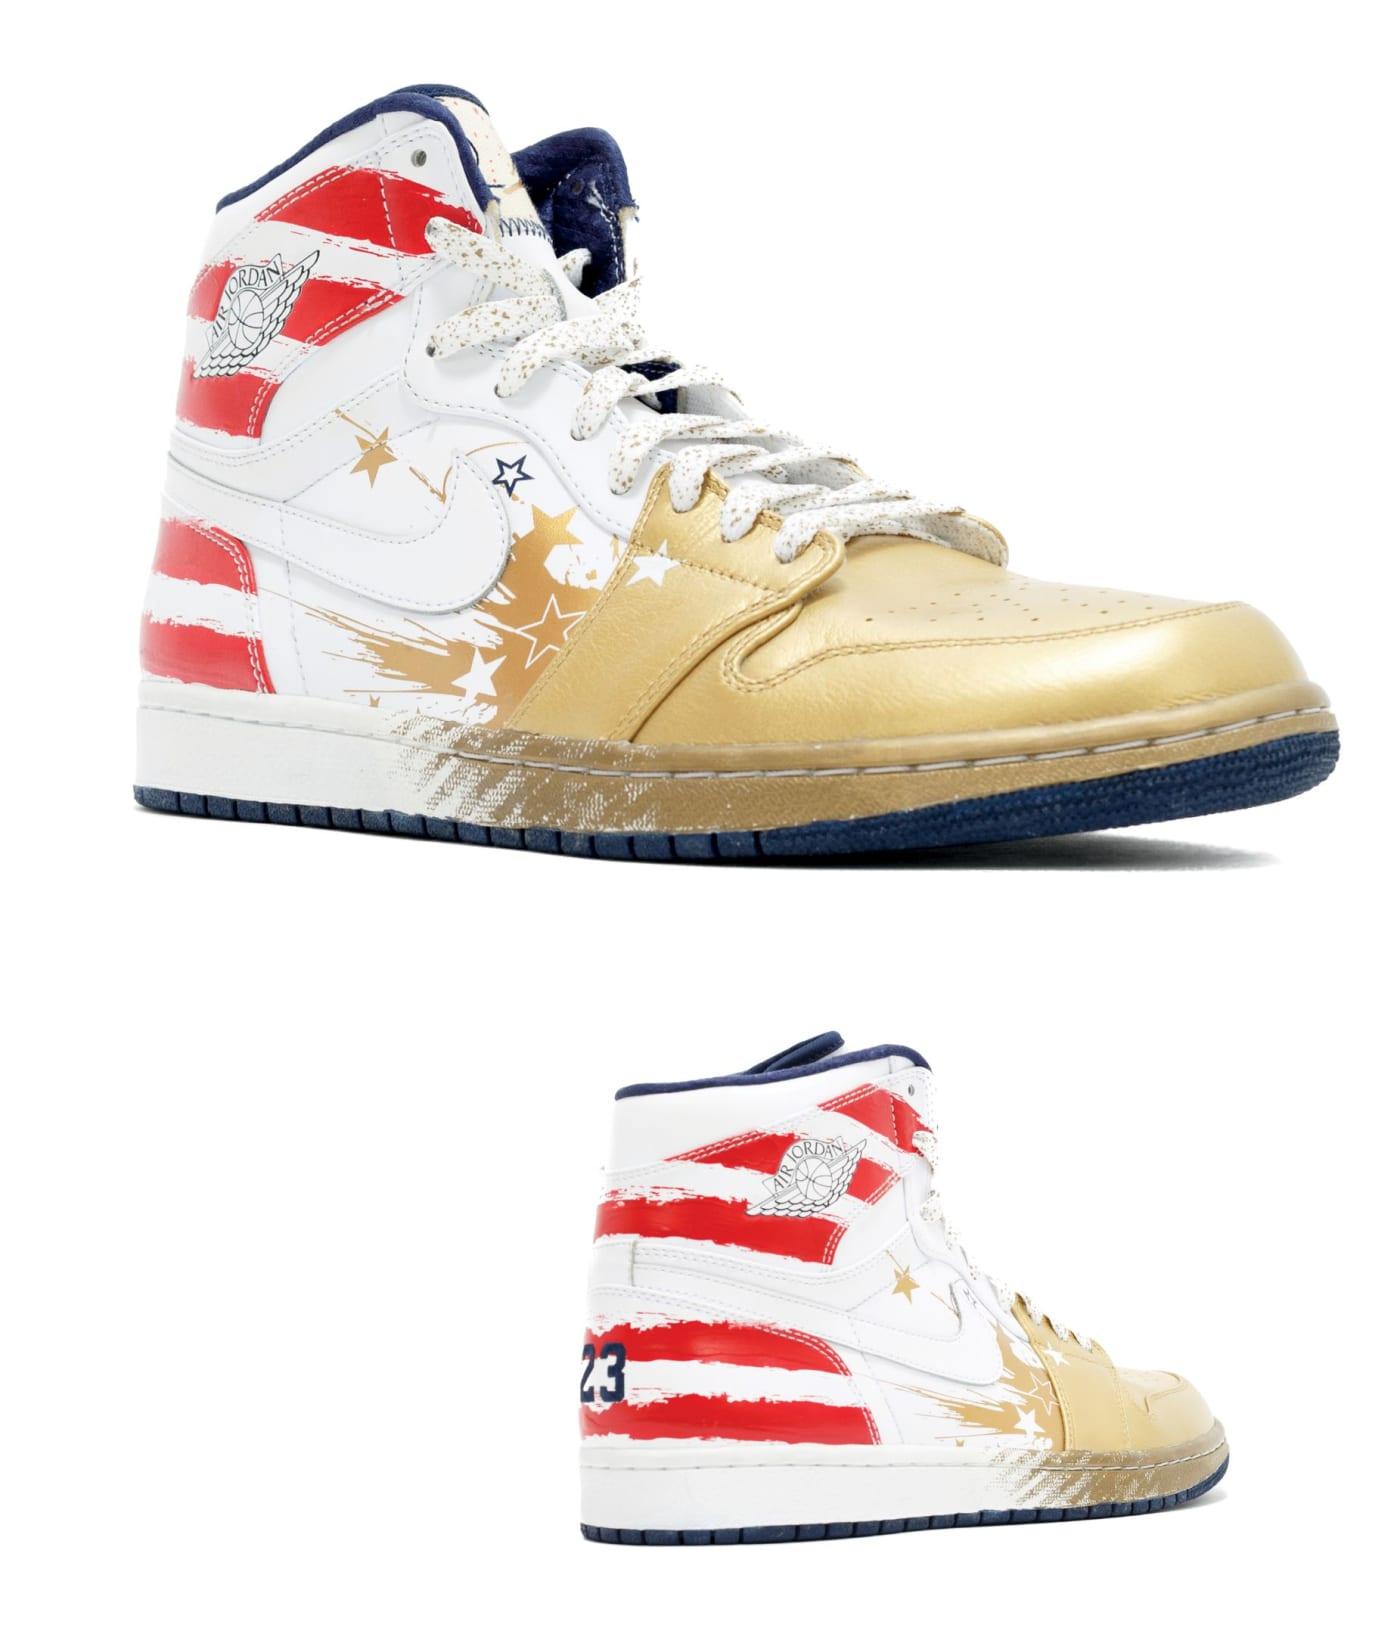 Giày thể thao collab DAVID WHITE X JORDAN BRAND, AIR JORDAN I RETRO WINGS FOR THE FUTURE